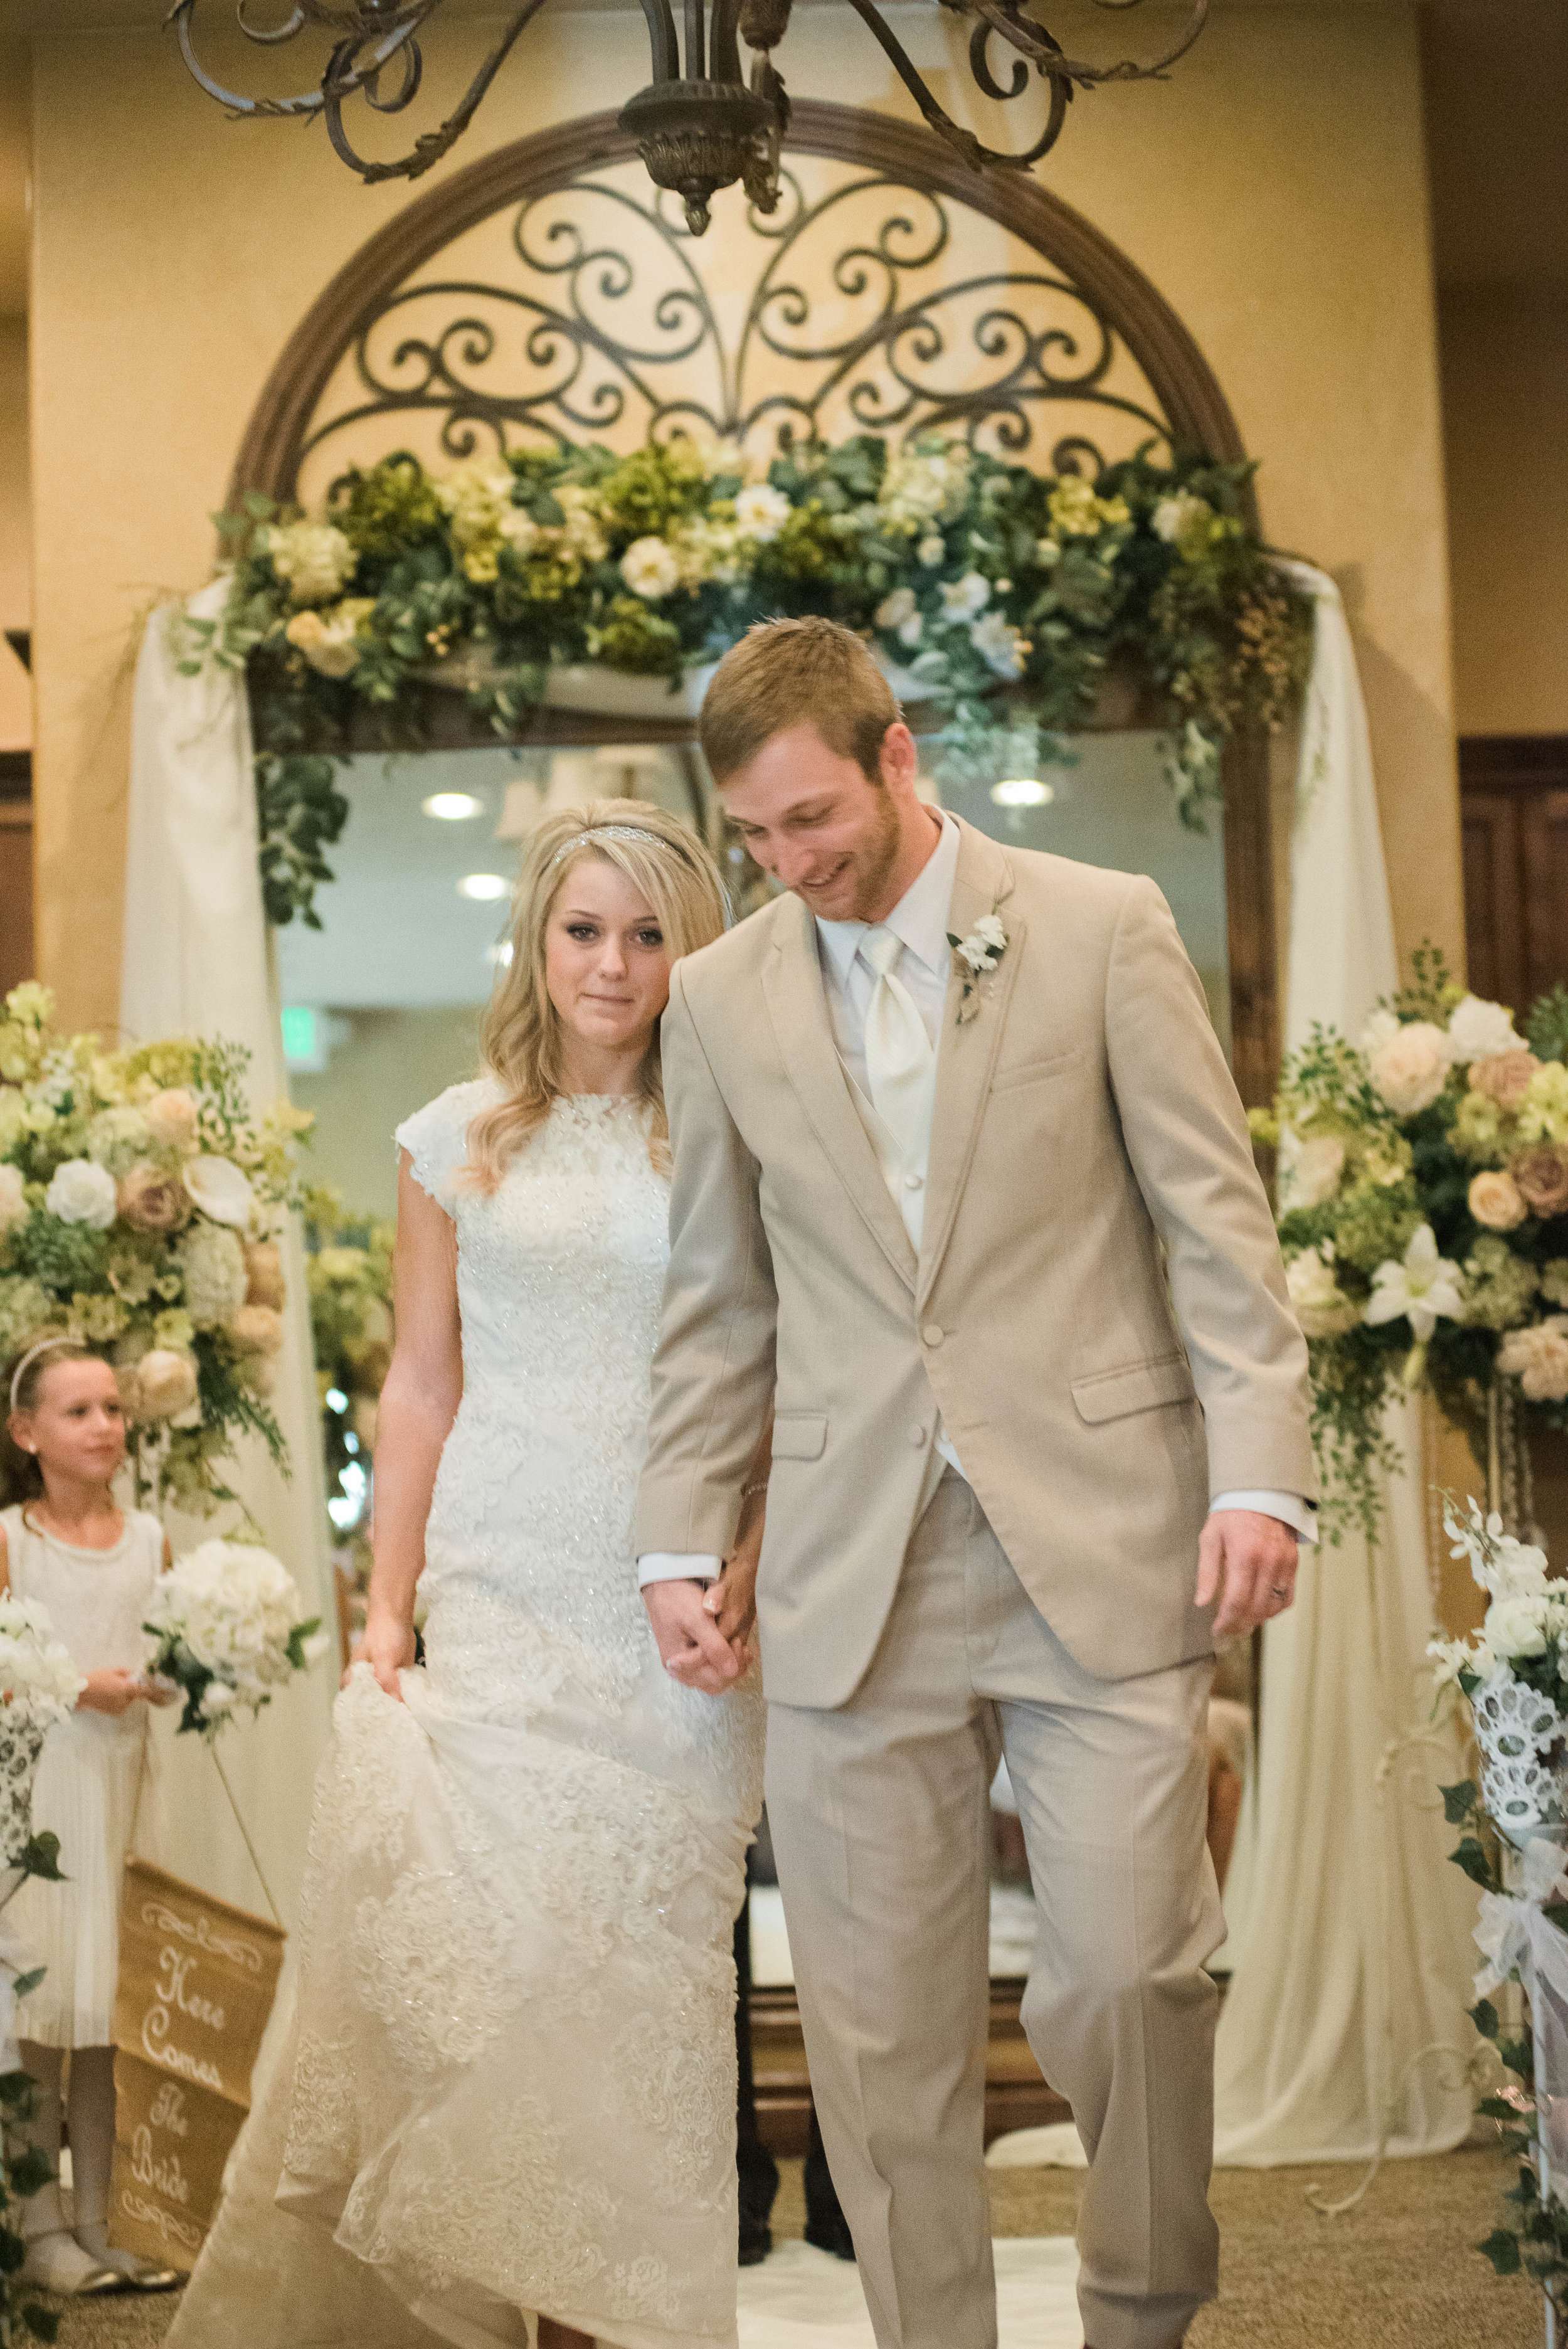 DANIEL+LACI-WEDDING-Sadie_Banks_Photography-236.jpg